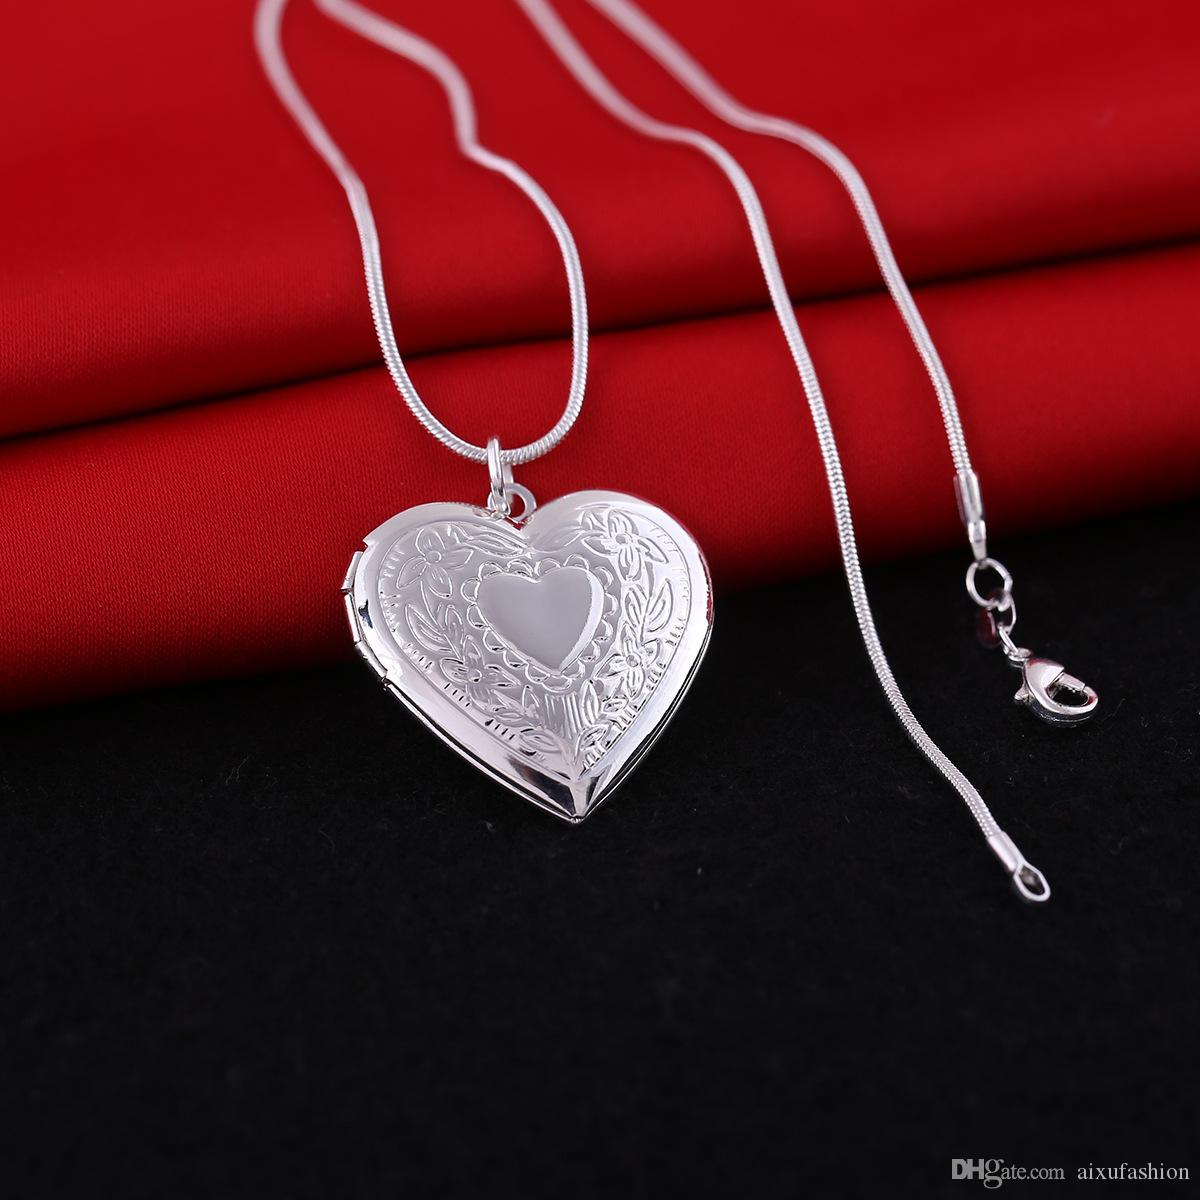 Plateado plata medallones colgantes collares corazón tallado marcos de fotos puede abrir collar medallón regalo de San Valentín para mujeres niña